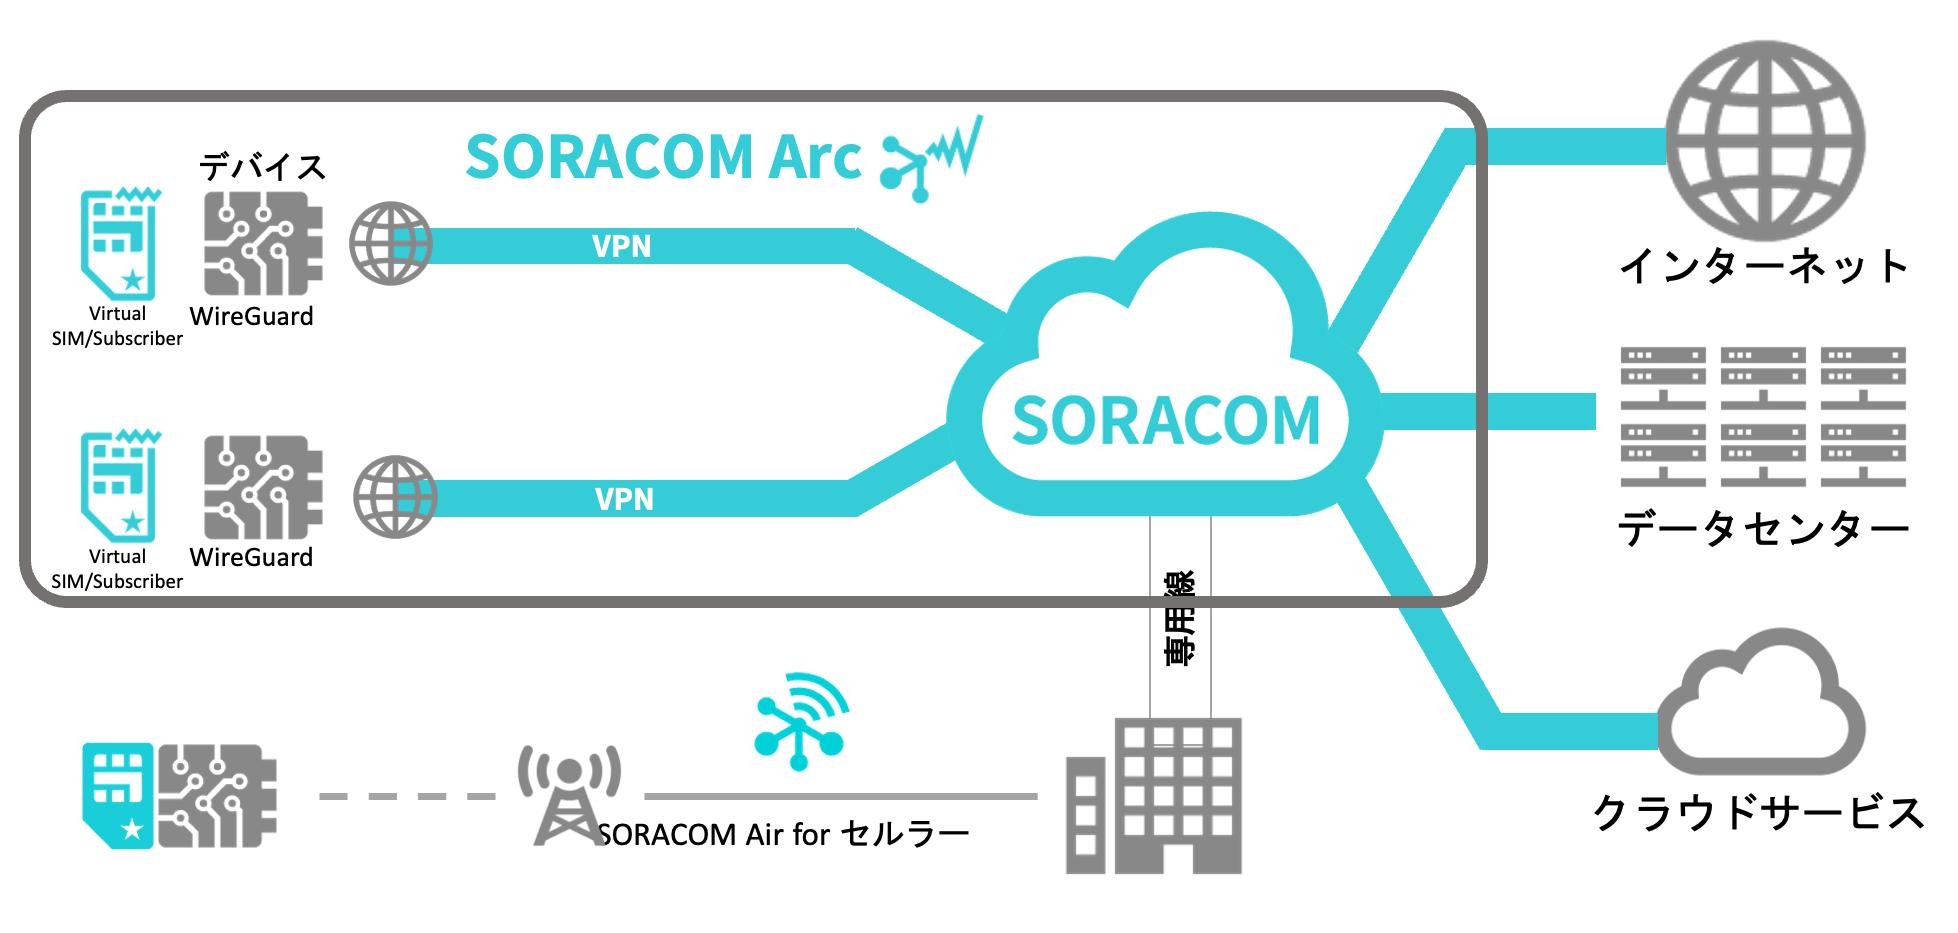 SORACOM Arcについて